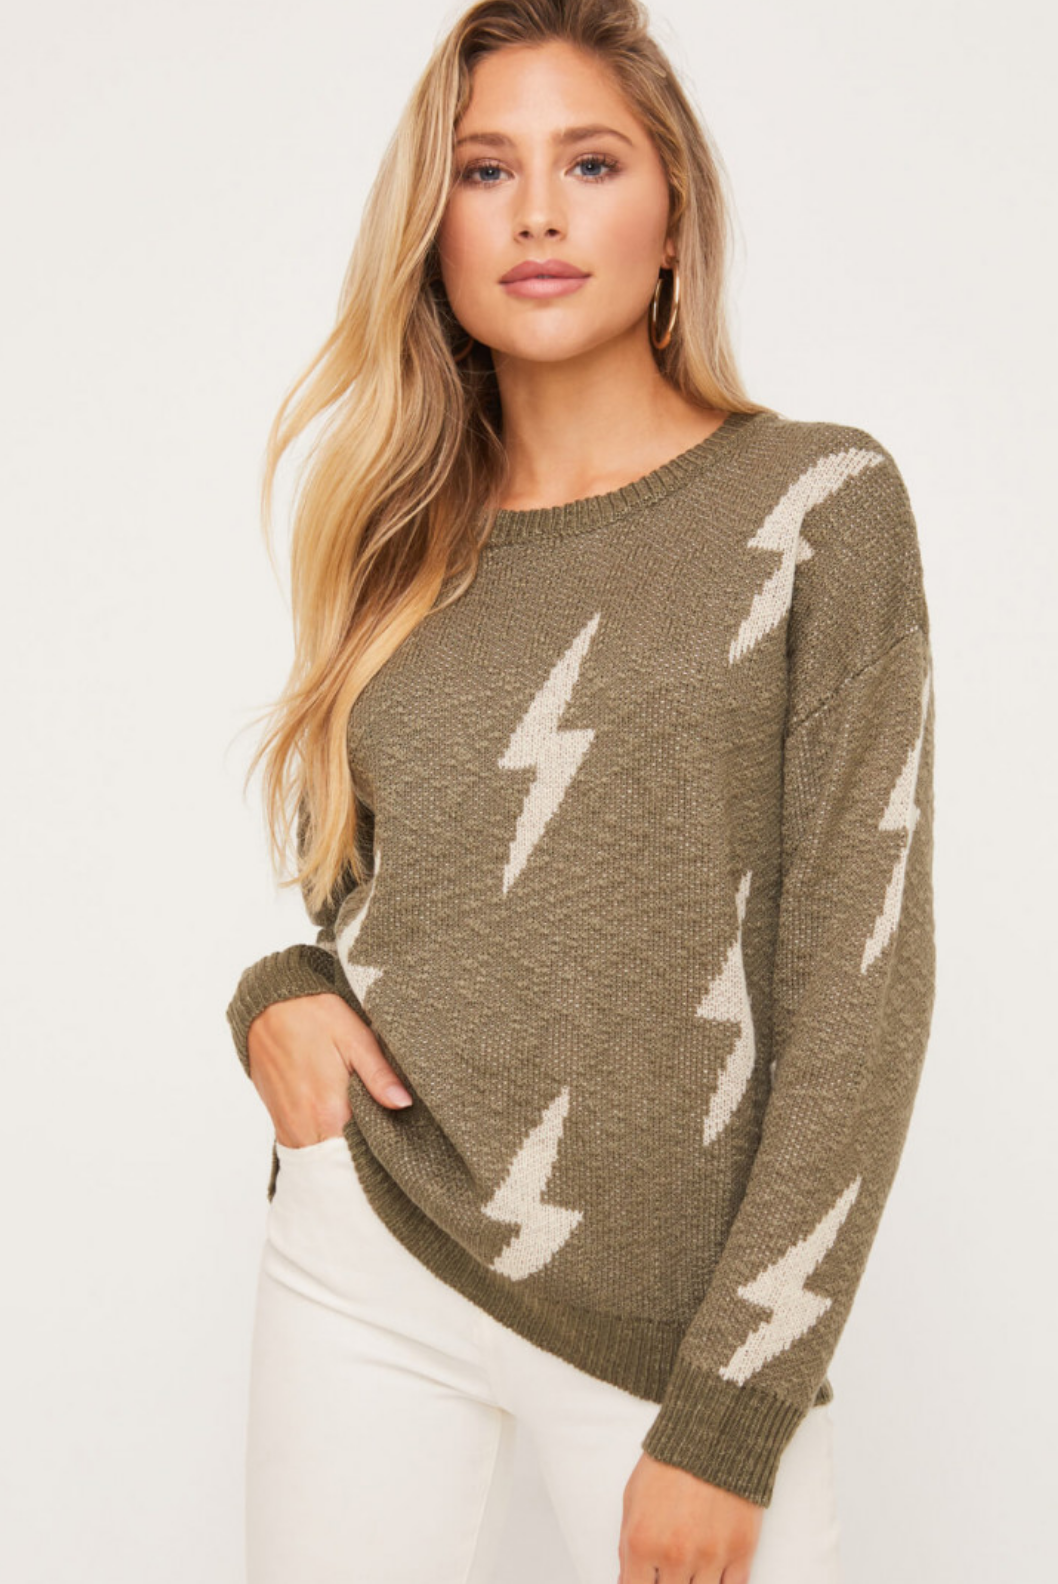 Lush Lightning Crewneck Sweater-Olive